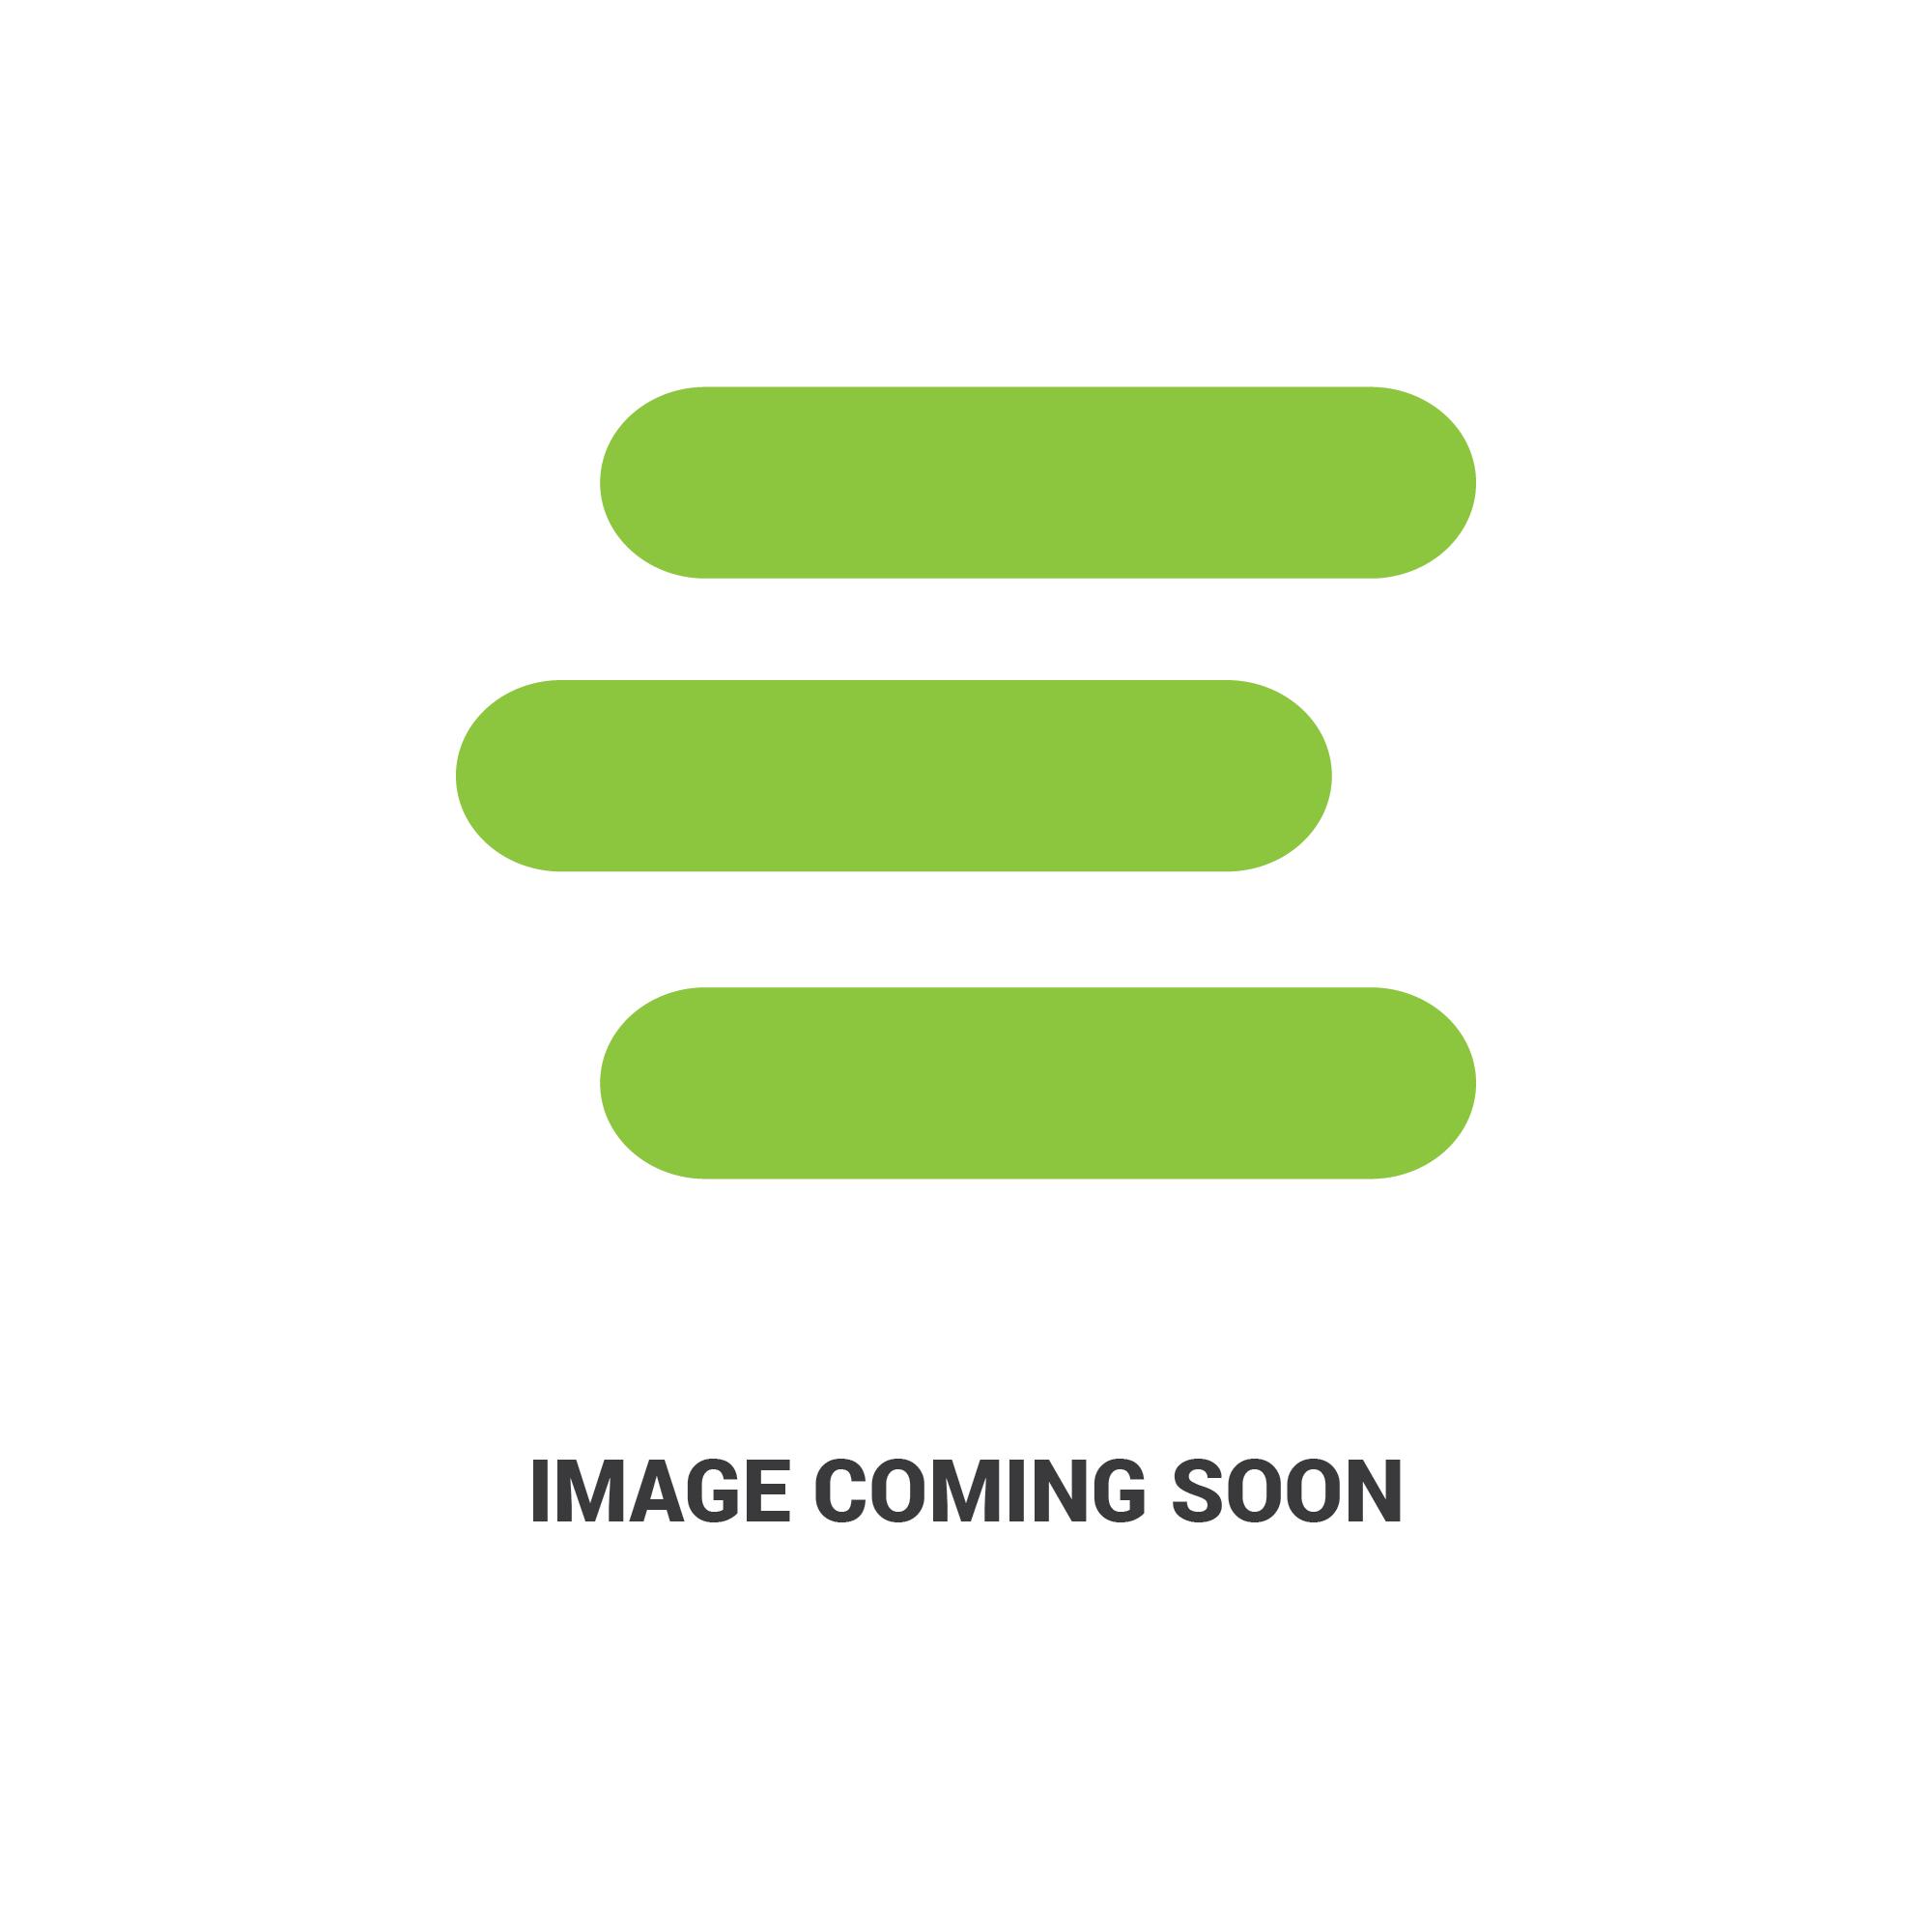 E-K311686edit 1.jpg